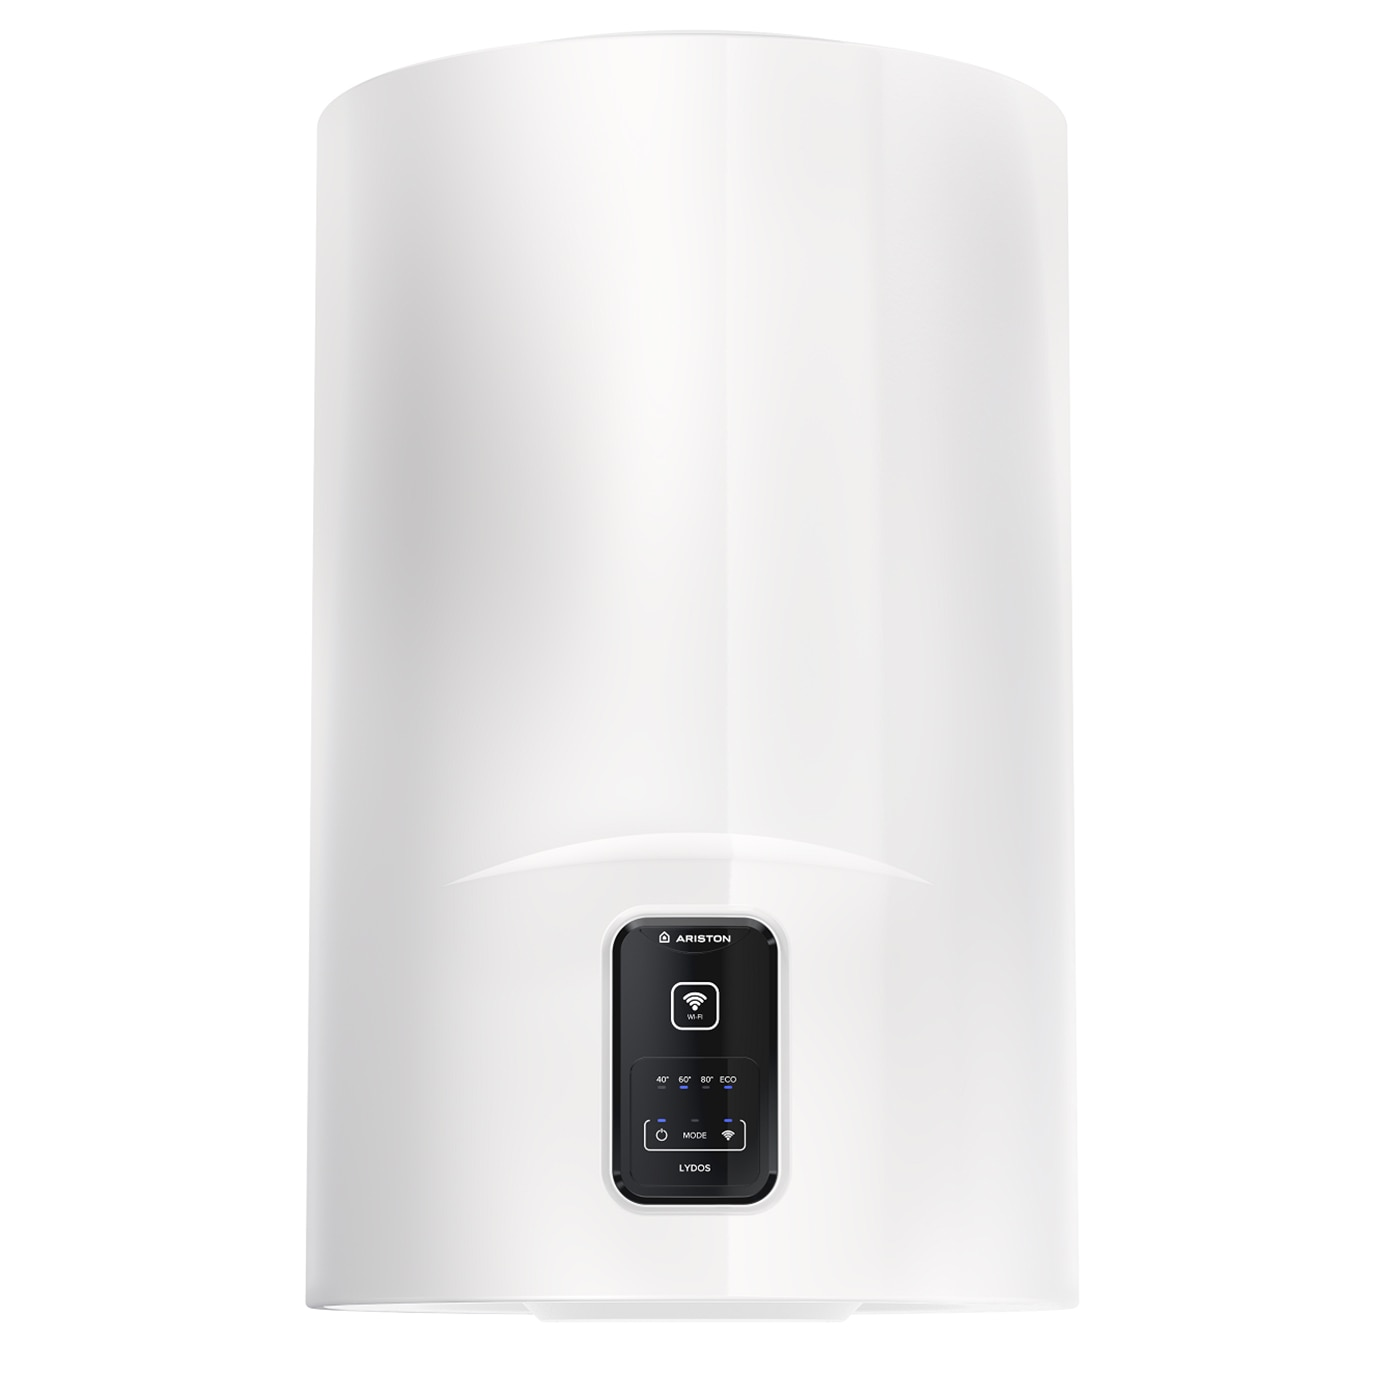 Fotografie Boiler electric Ariston Lydos Wi-Fi 80L, 1800 W, conectivitate internet, rezervor emailat cu Titan